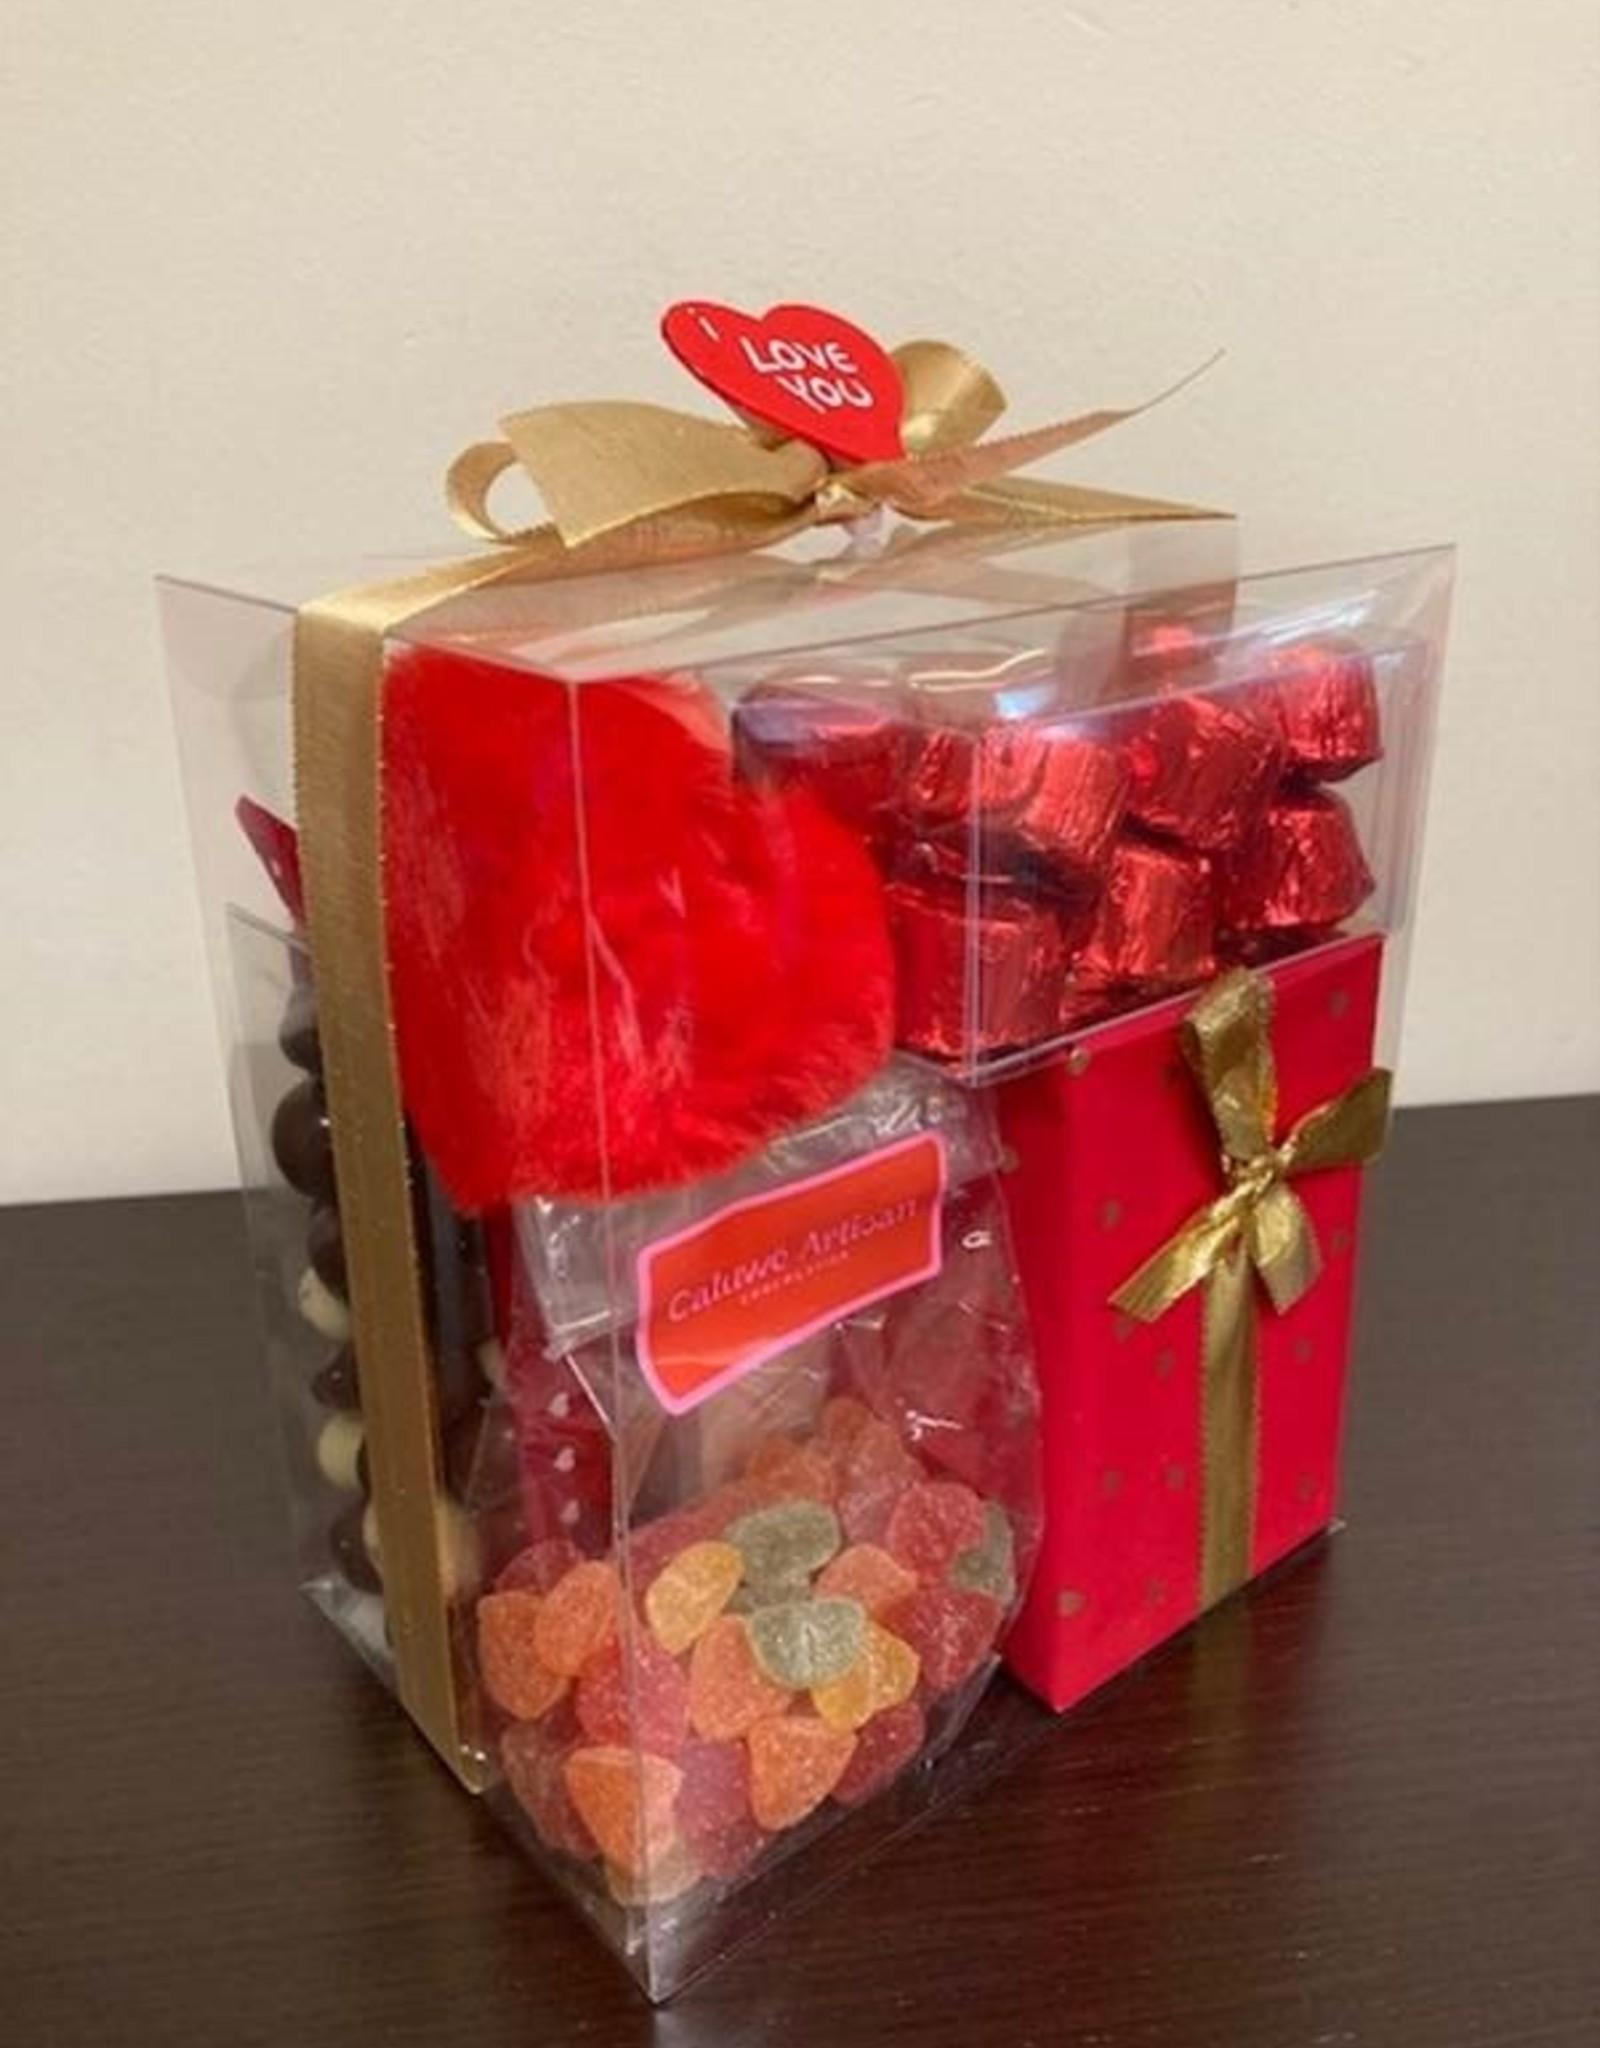 Caluwe Artisan Valentine box